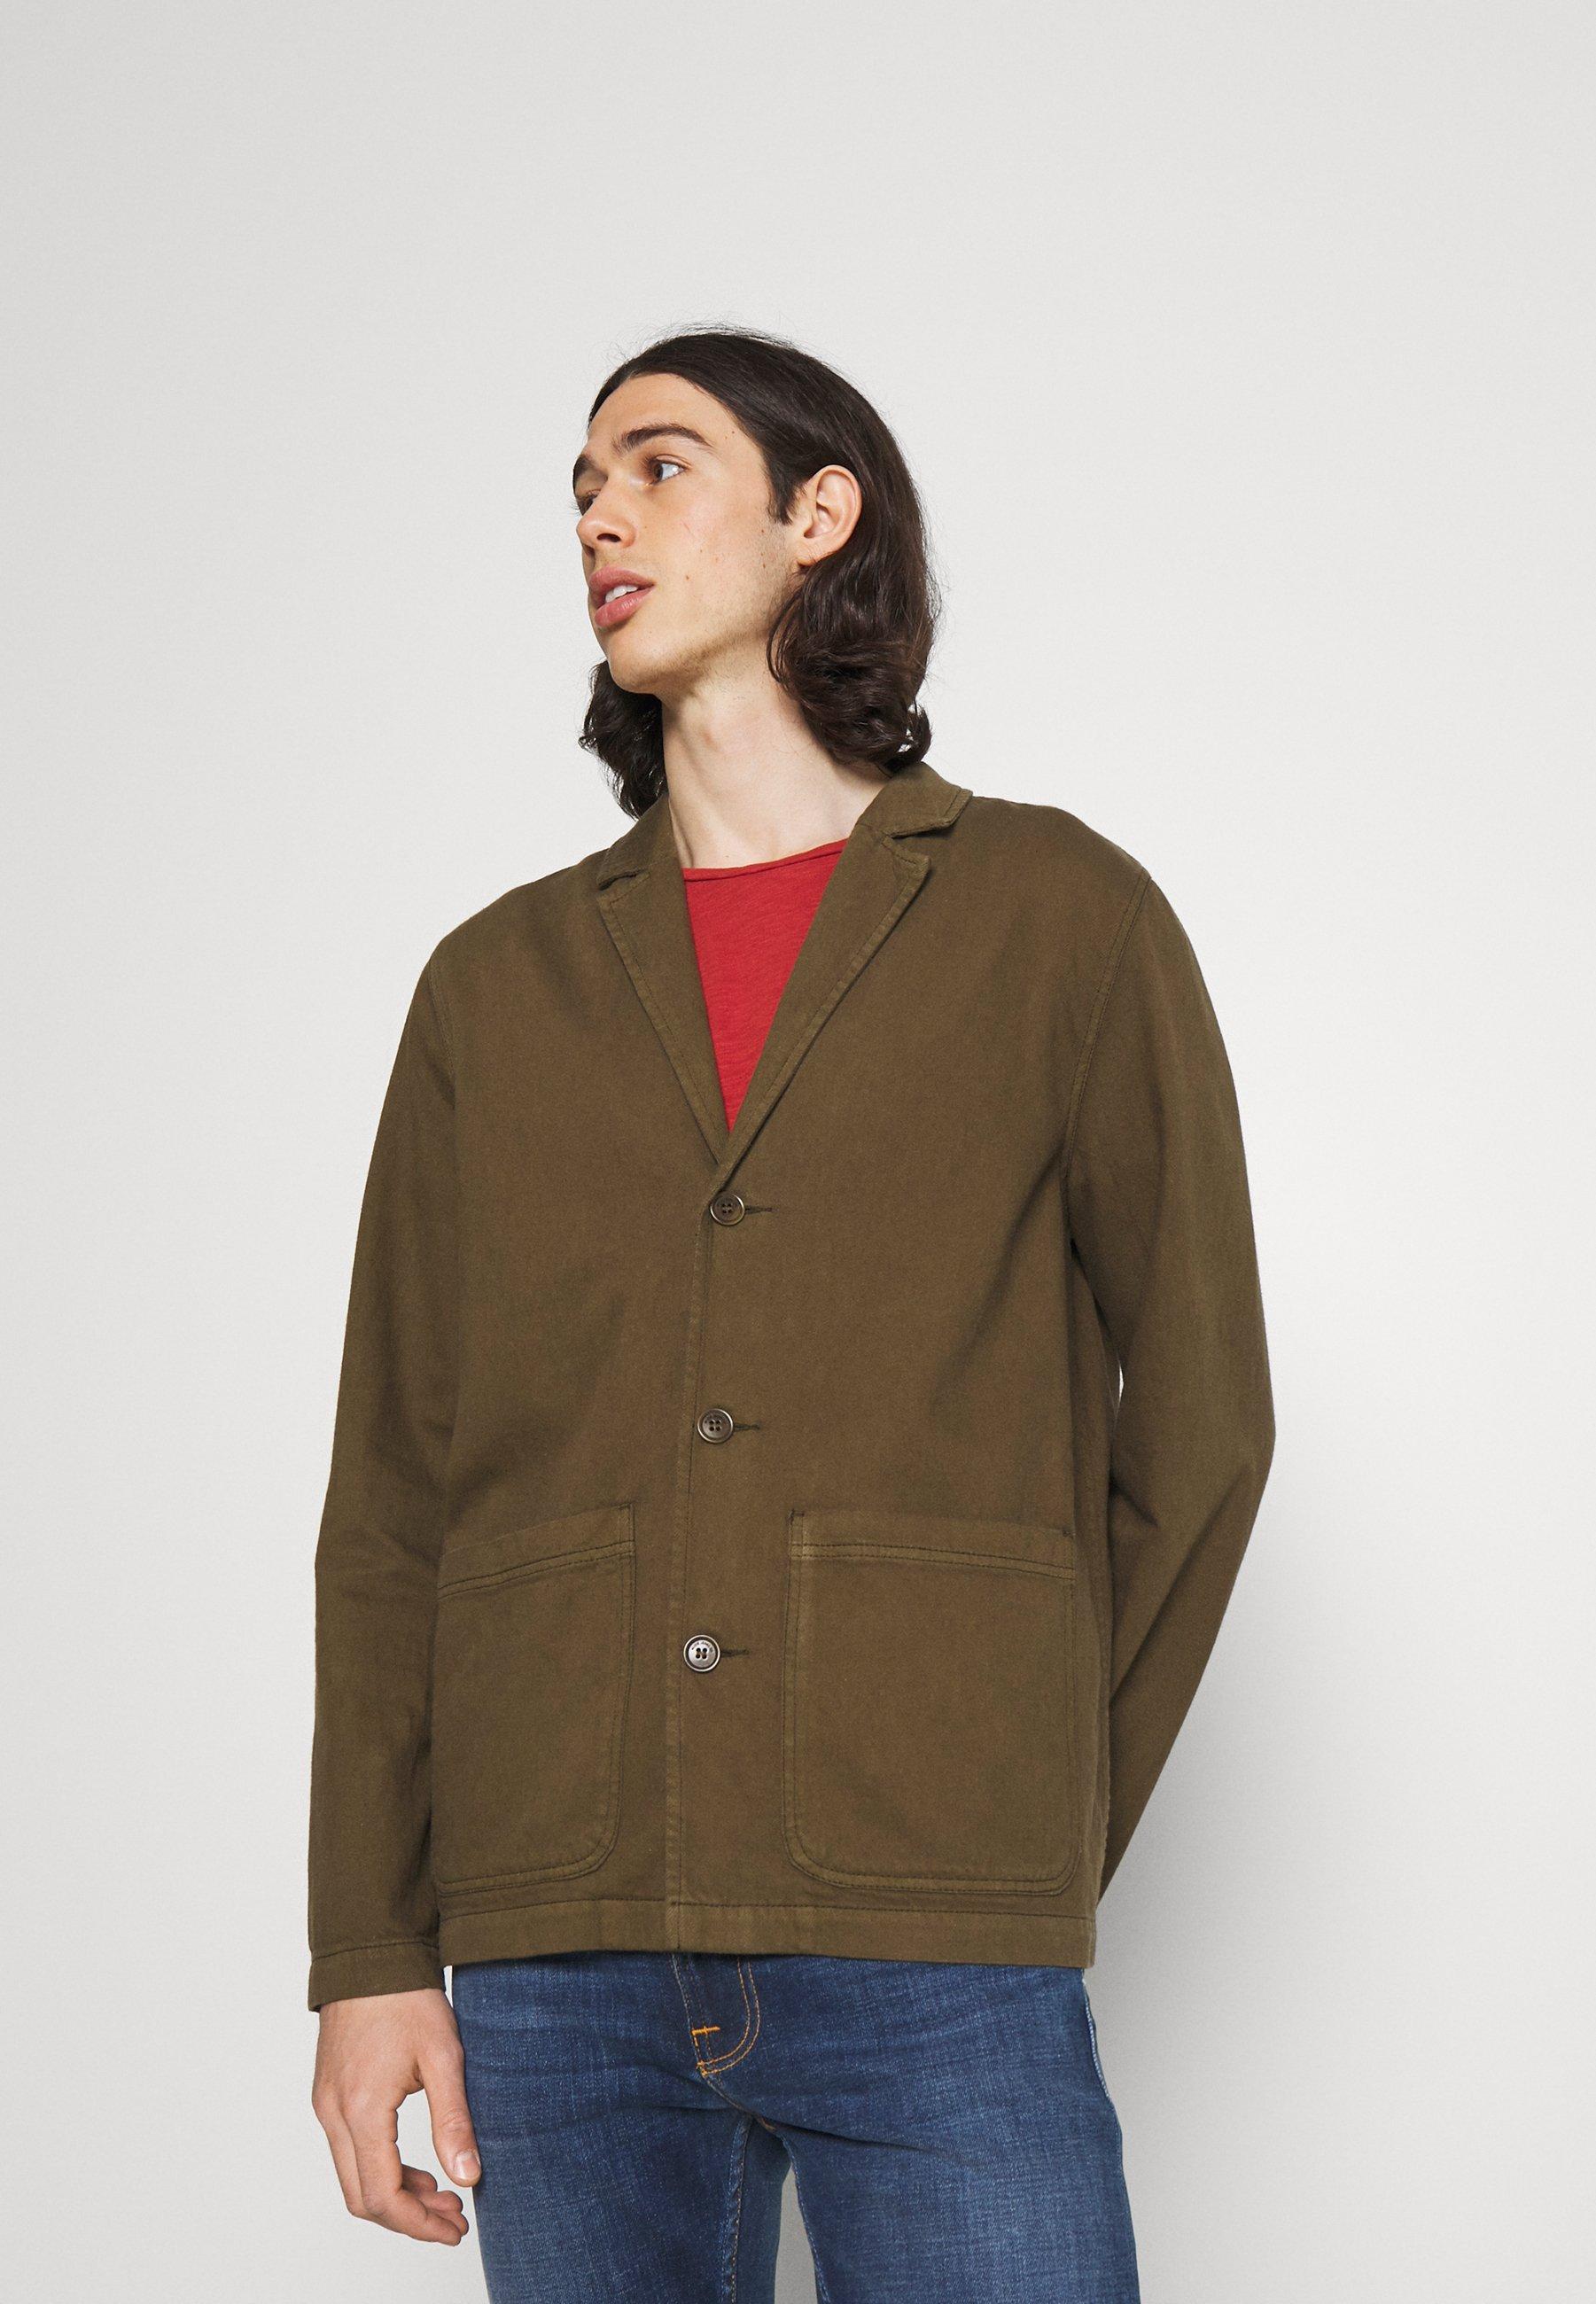 Men ROLAND JACKET - Blazer jacket